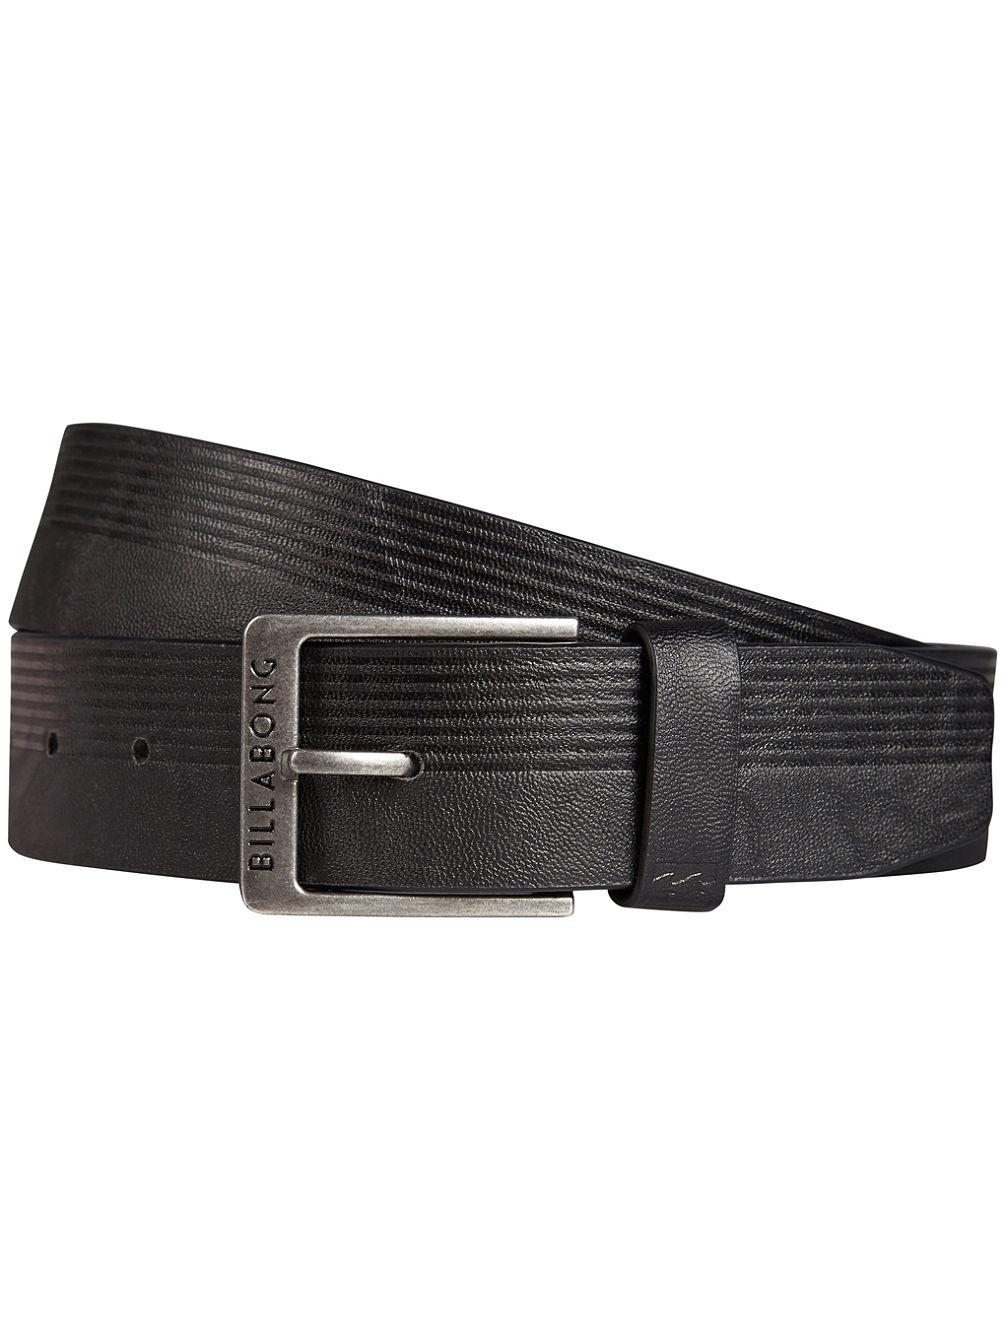 c4e0777e6 Buy Billabong Vacant Belt online at Blue Tomato